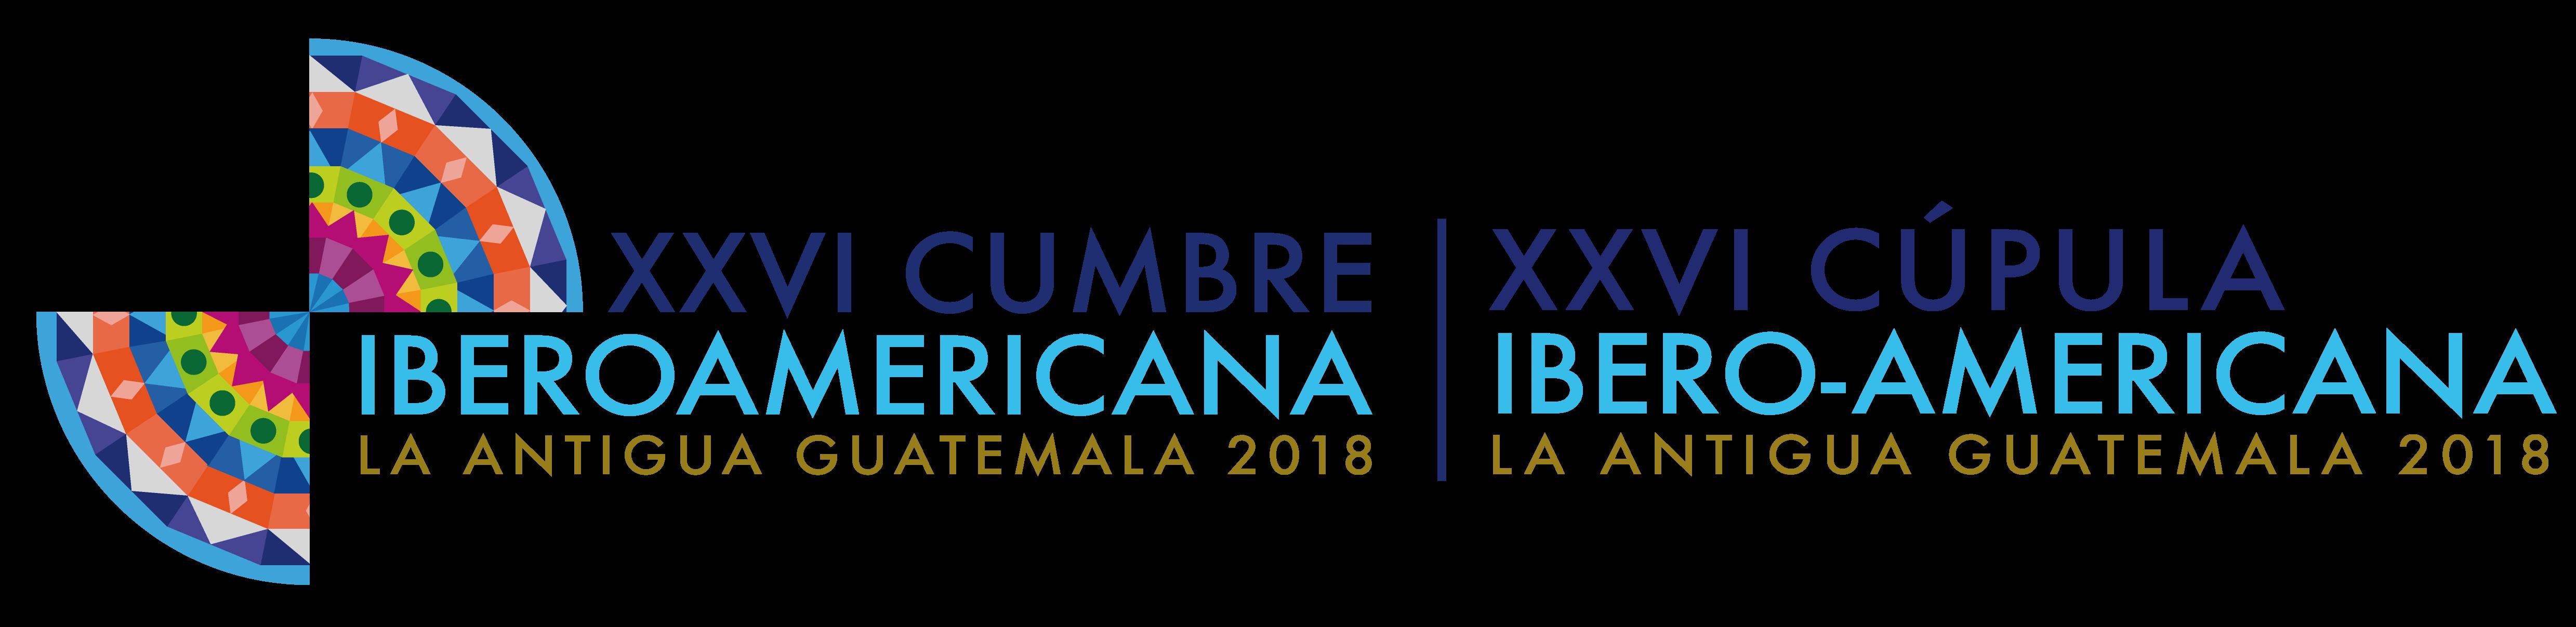 "logotipo XXVI Cúpula Ibero-Americana La Antigua Guatemala 2018 – ""Uma Ibero-américa próspera, inclusiva e sustentável"""